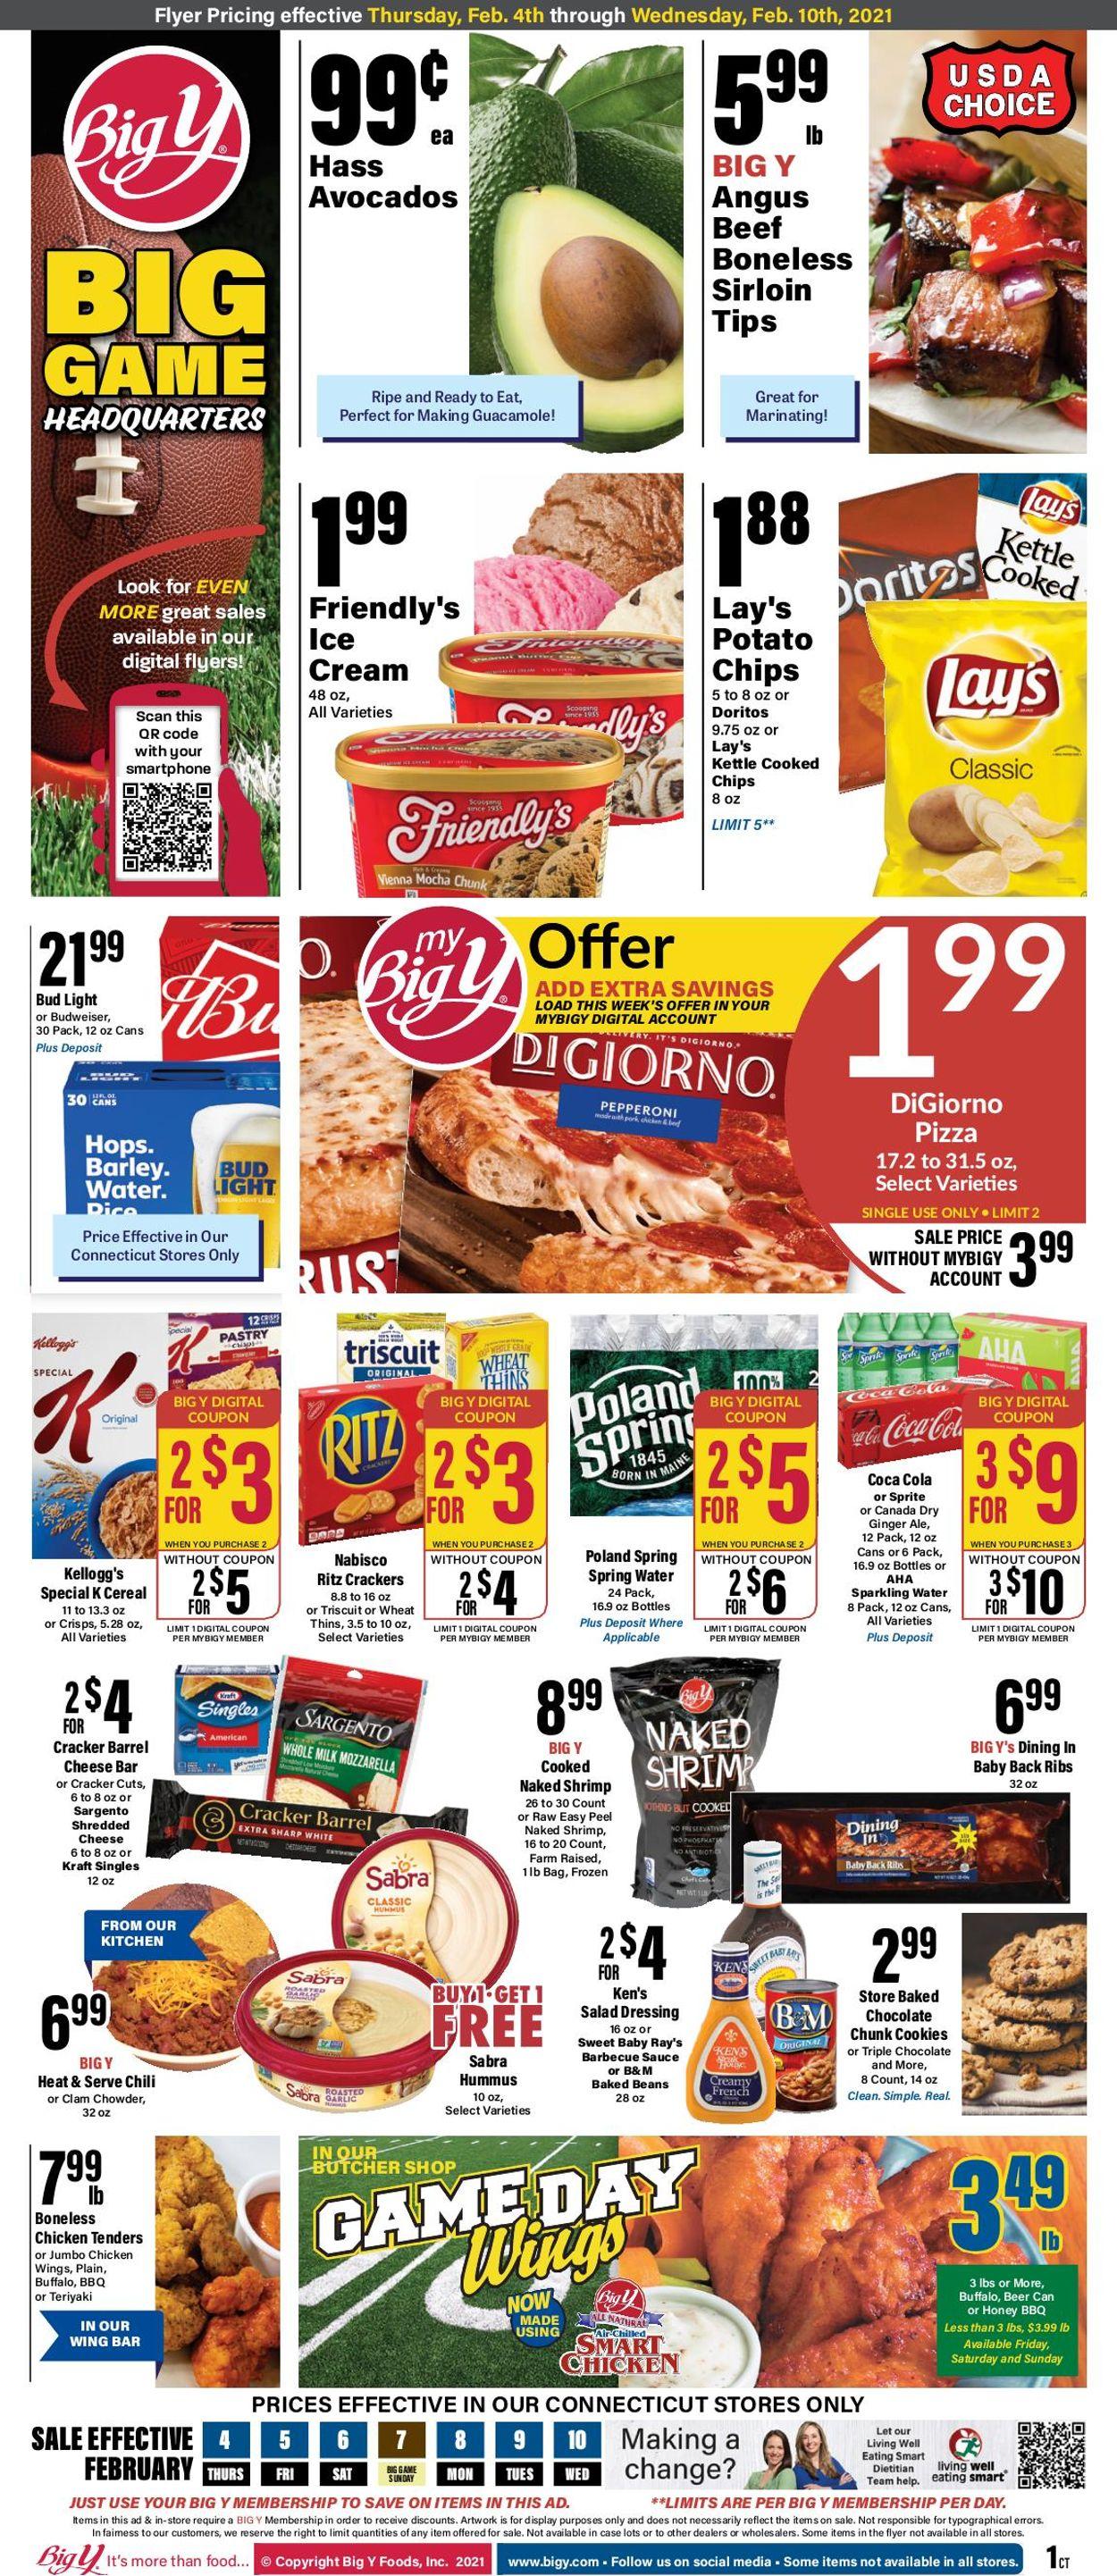 Big Y Weekly Ad Circular - valid 02/04-02/10/2021